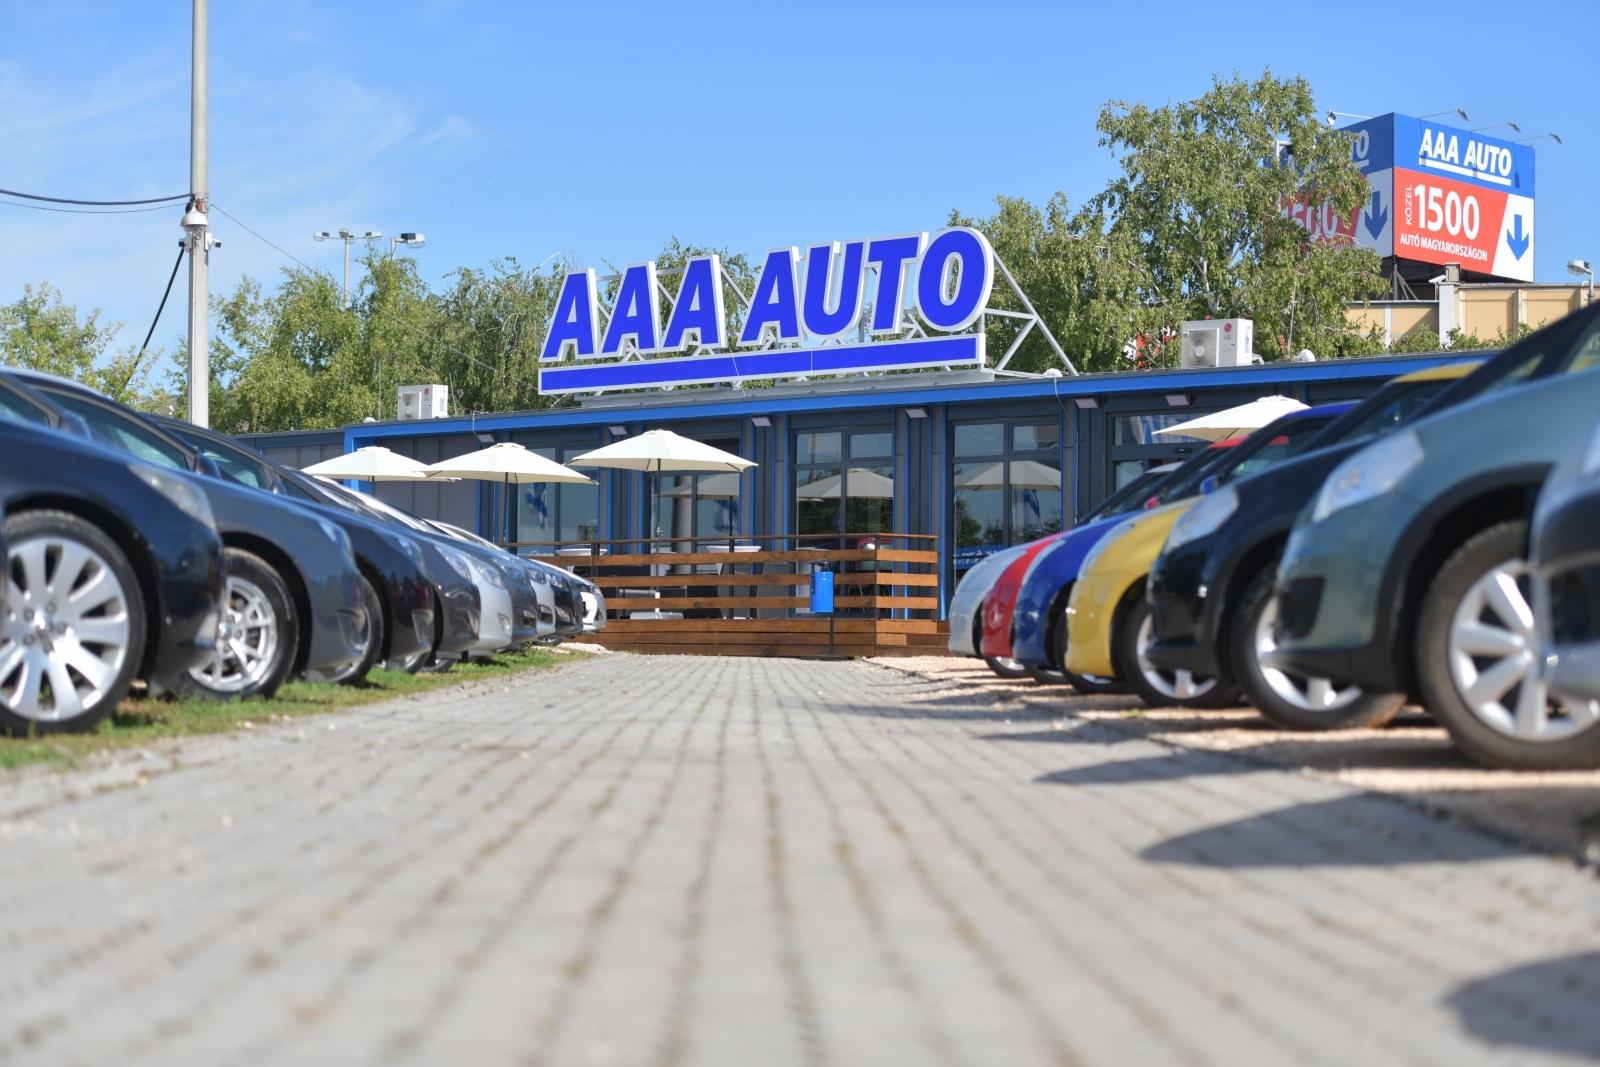 AAA AUTO budaörsi telephely megnyitó